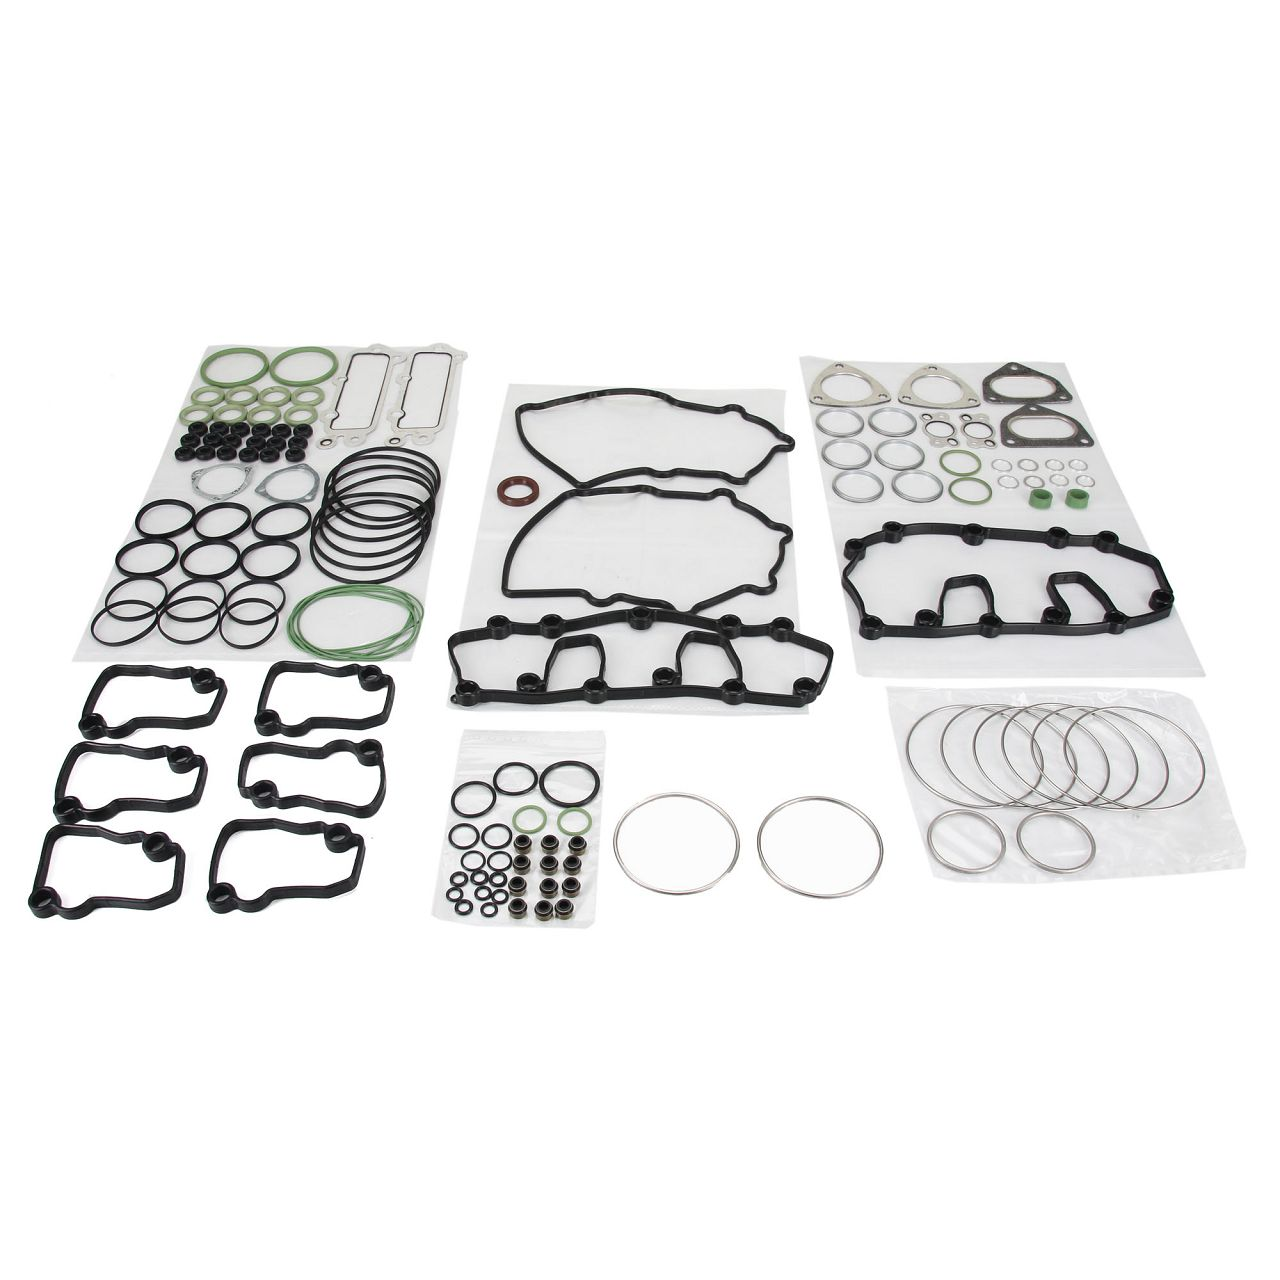 REINZ Motordichtsatz Zylinderkopfdichtung Satz PORSCHE 993 3.6/3.8 Carrera 272-301 PS